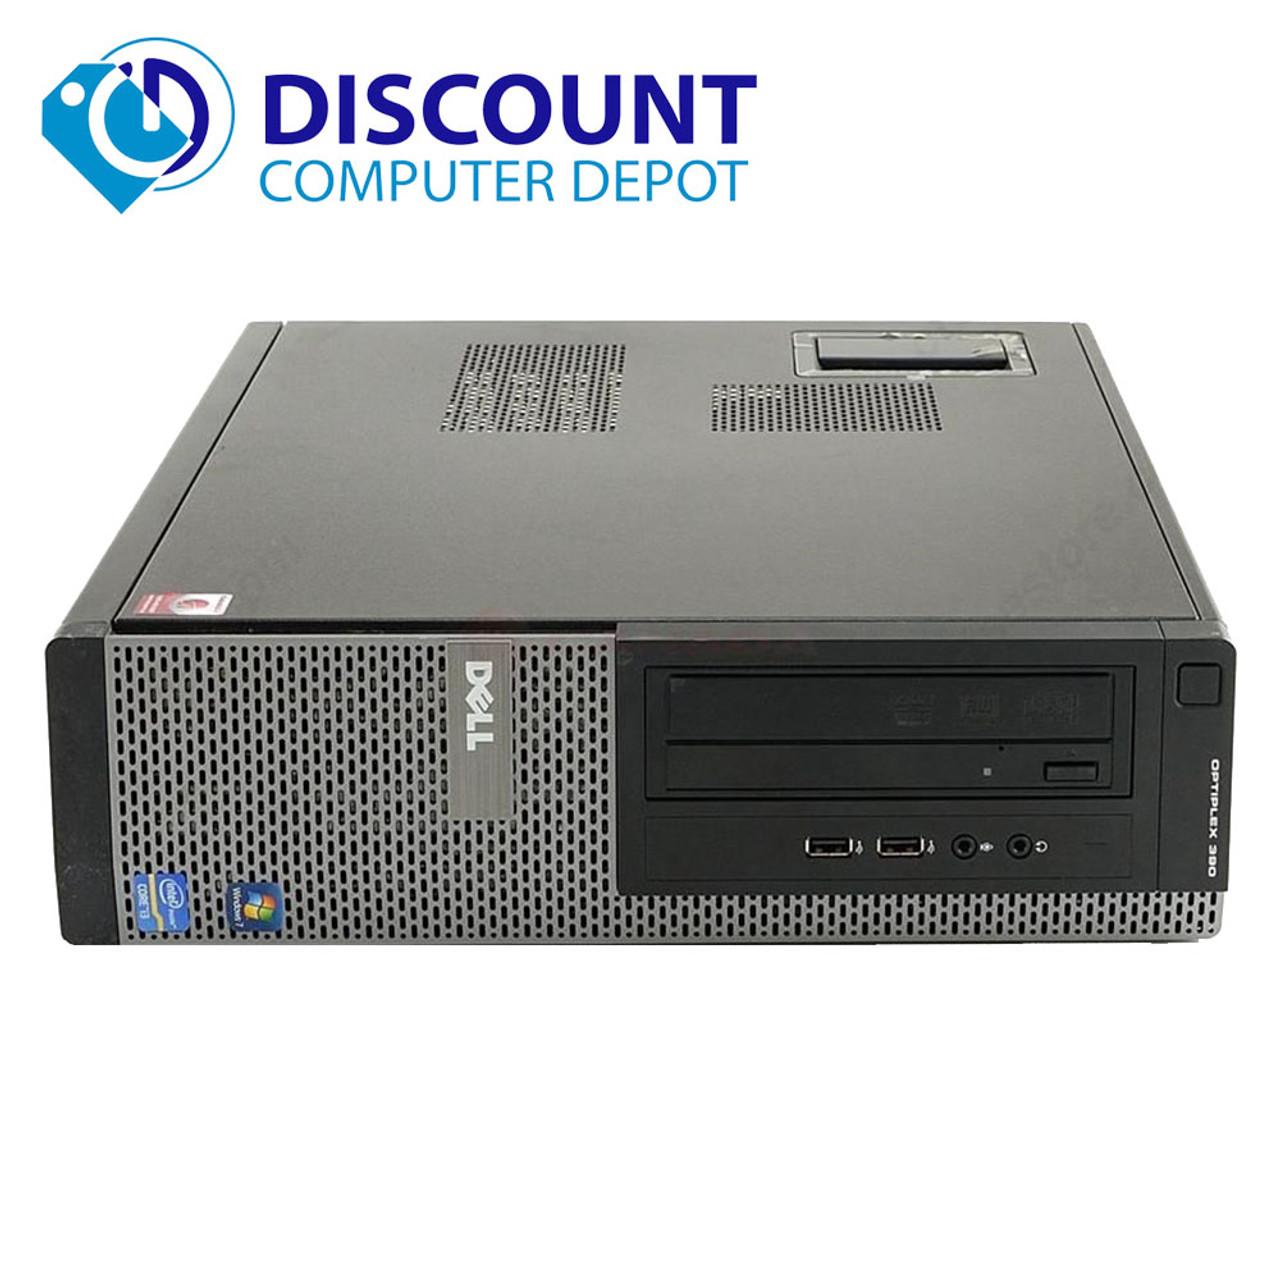 Dell Optiplex 390 Desktop Computer Pc Intel I3 3 3ghz 4gb 160gb Windows 10 Pro With Dual 2x19